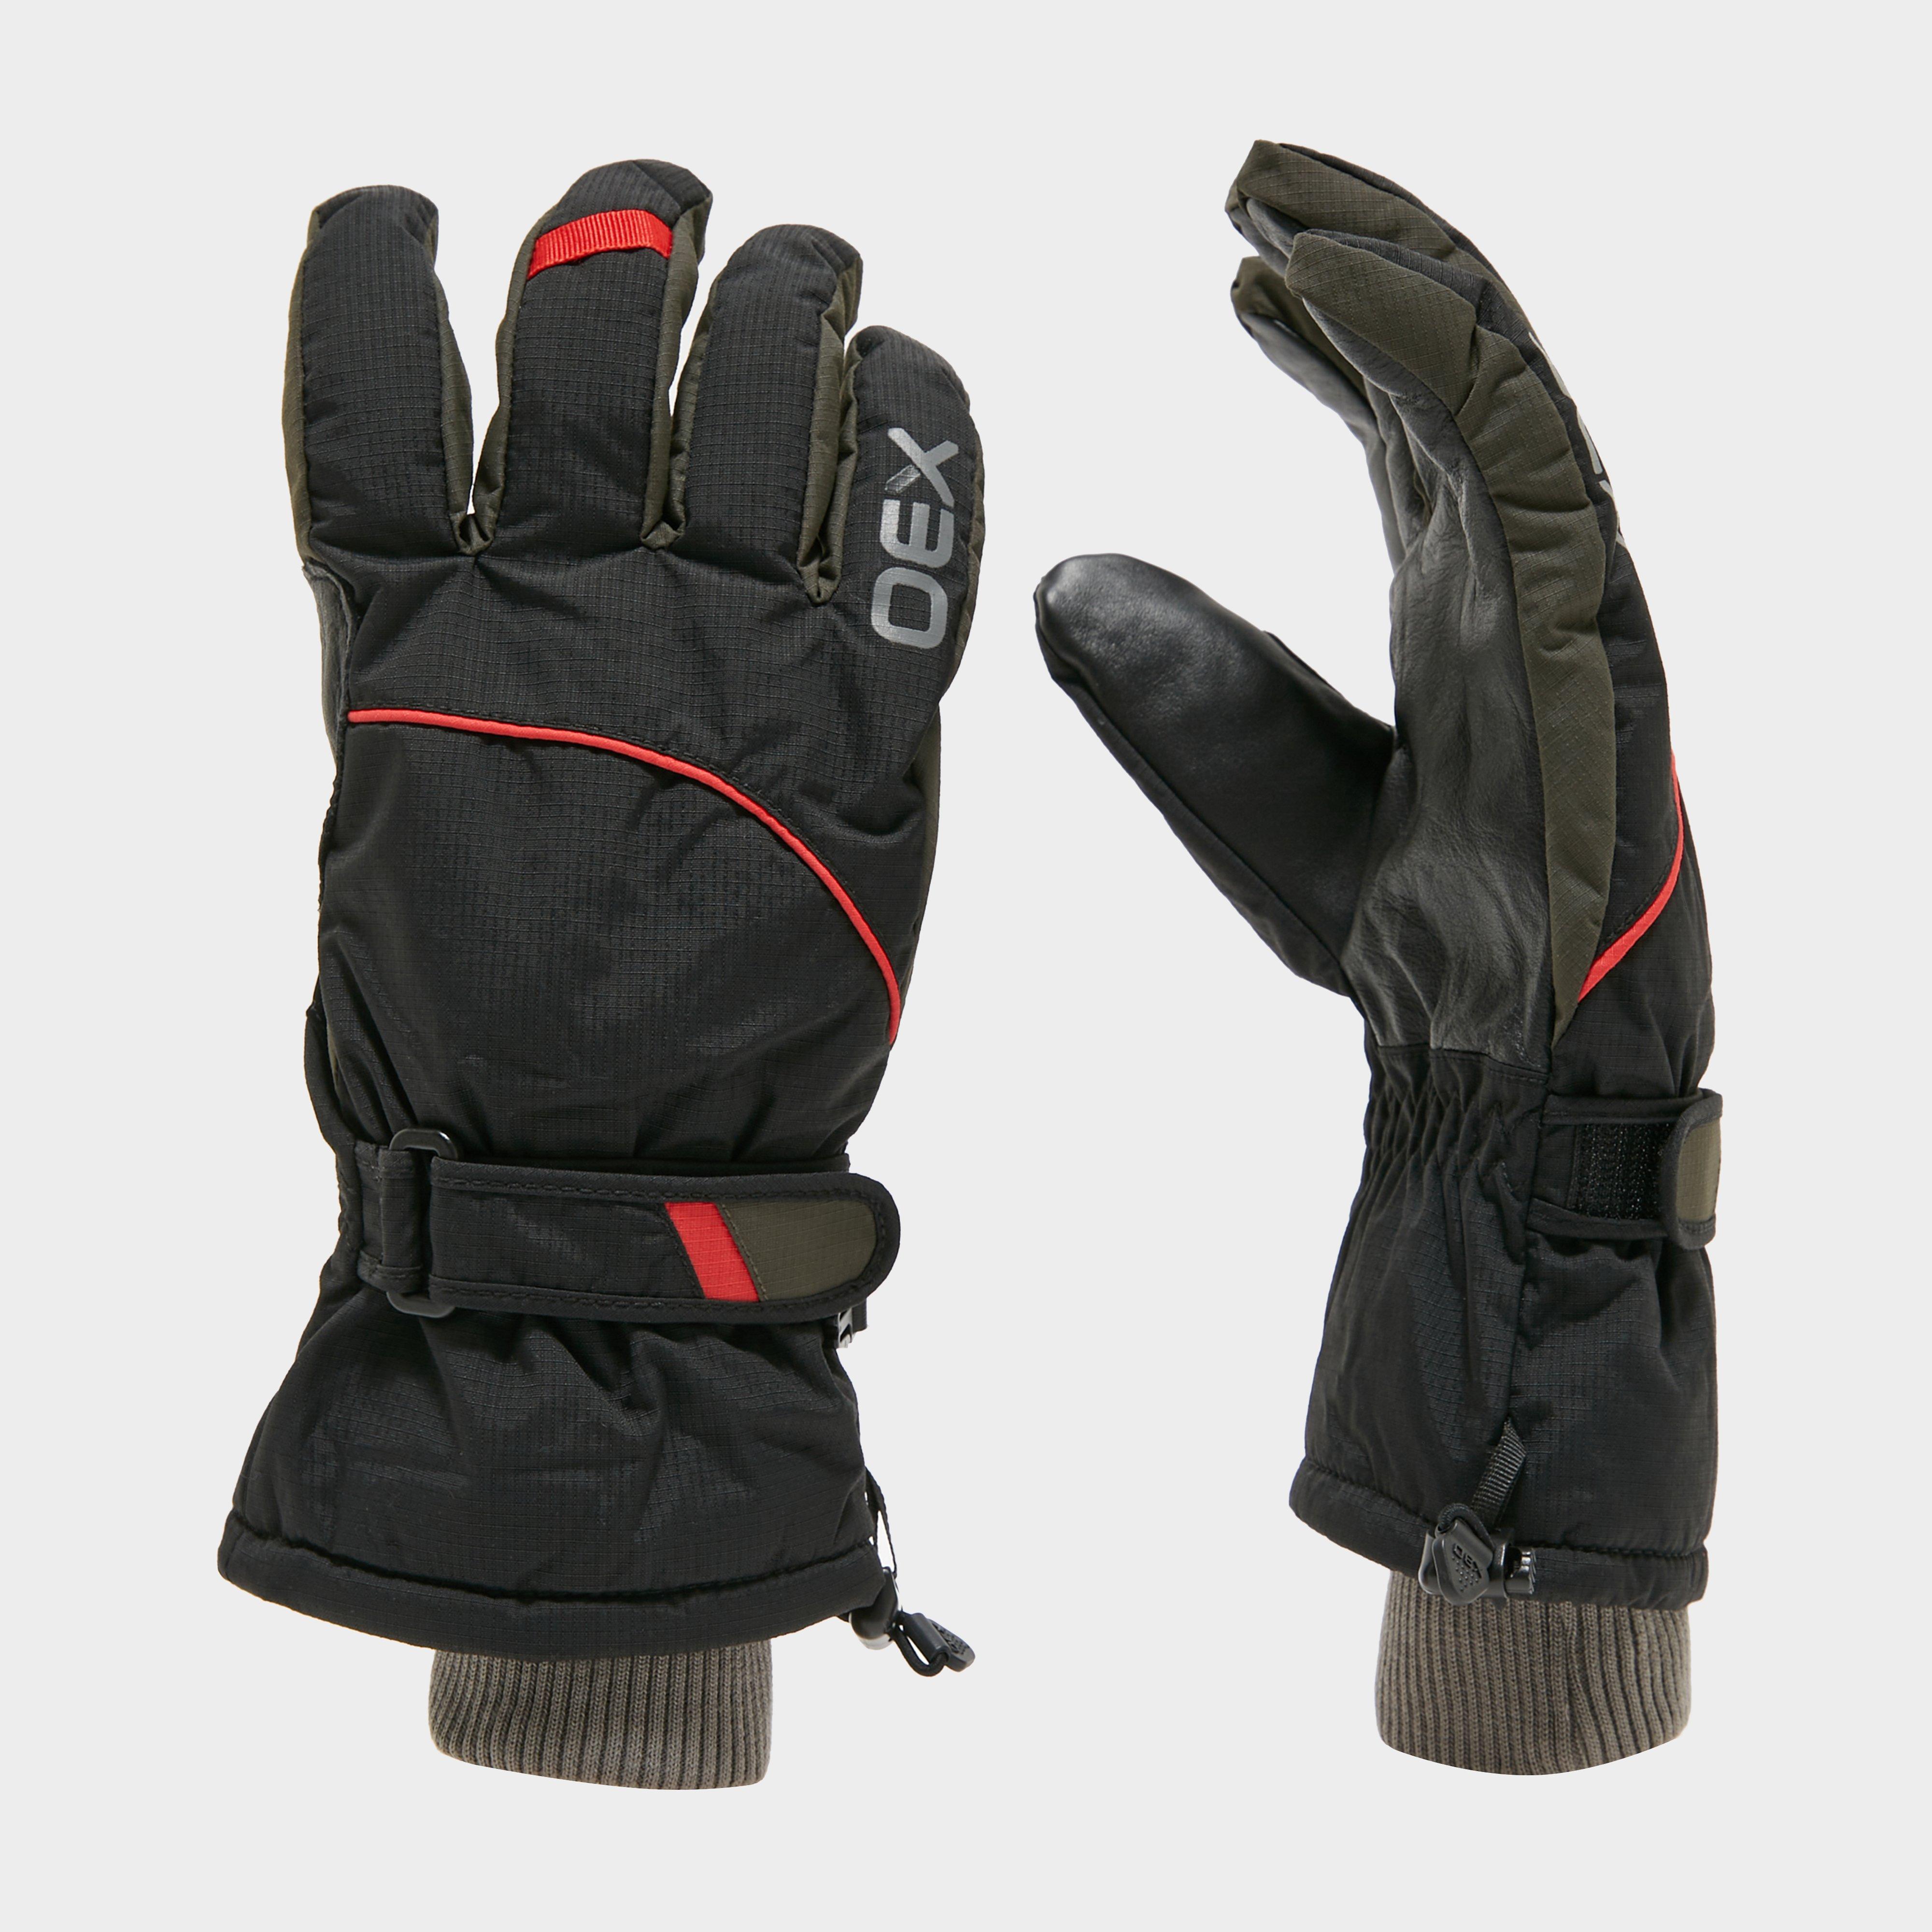 Oex Oex Summit Waterproof Gloves